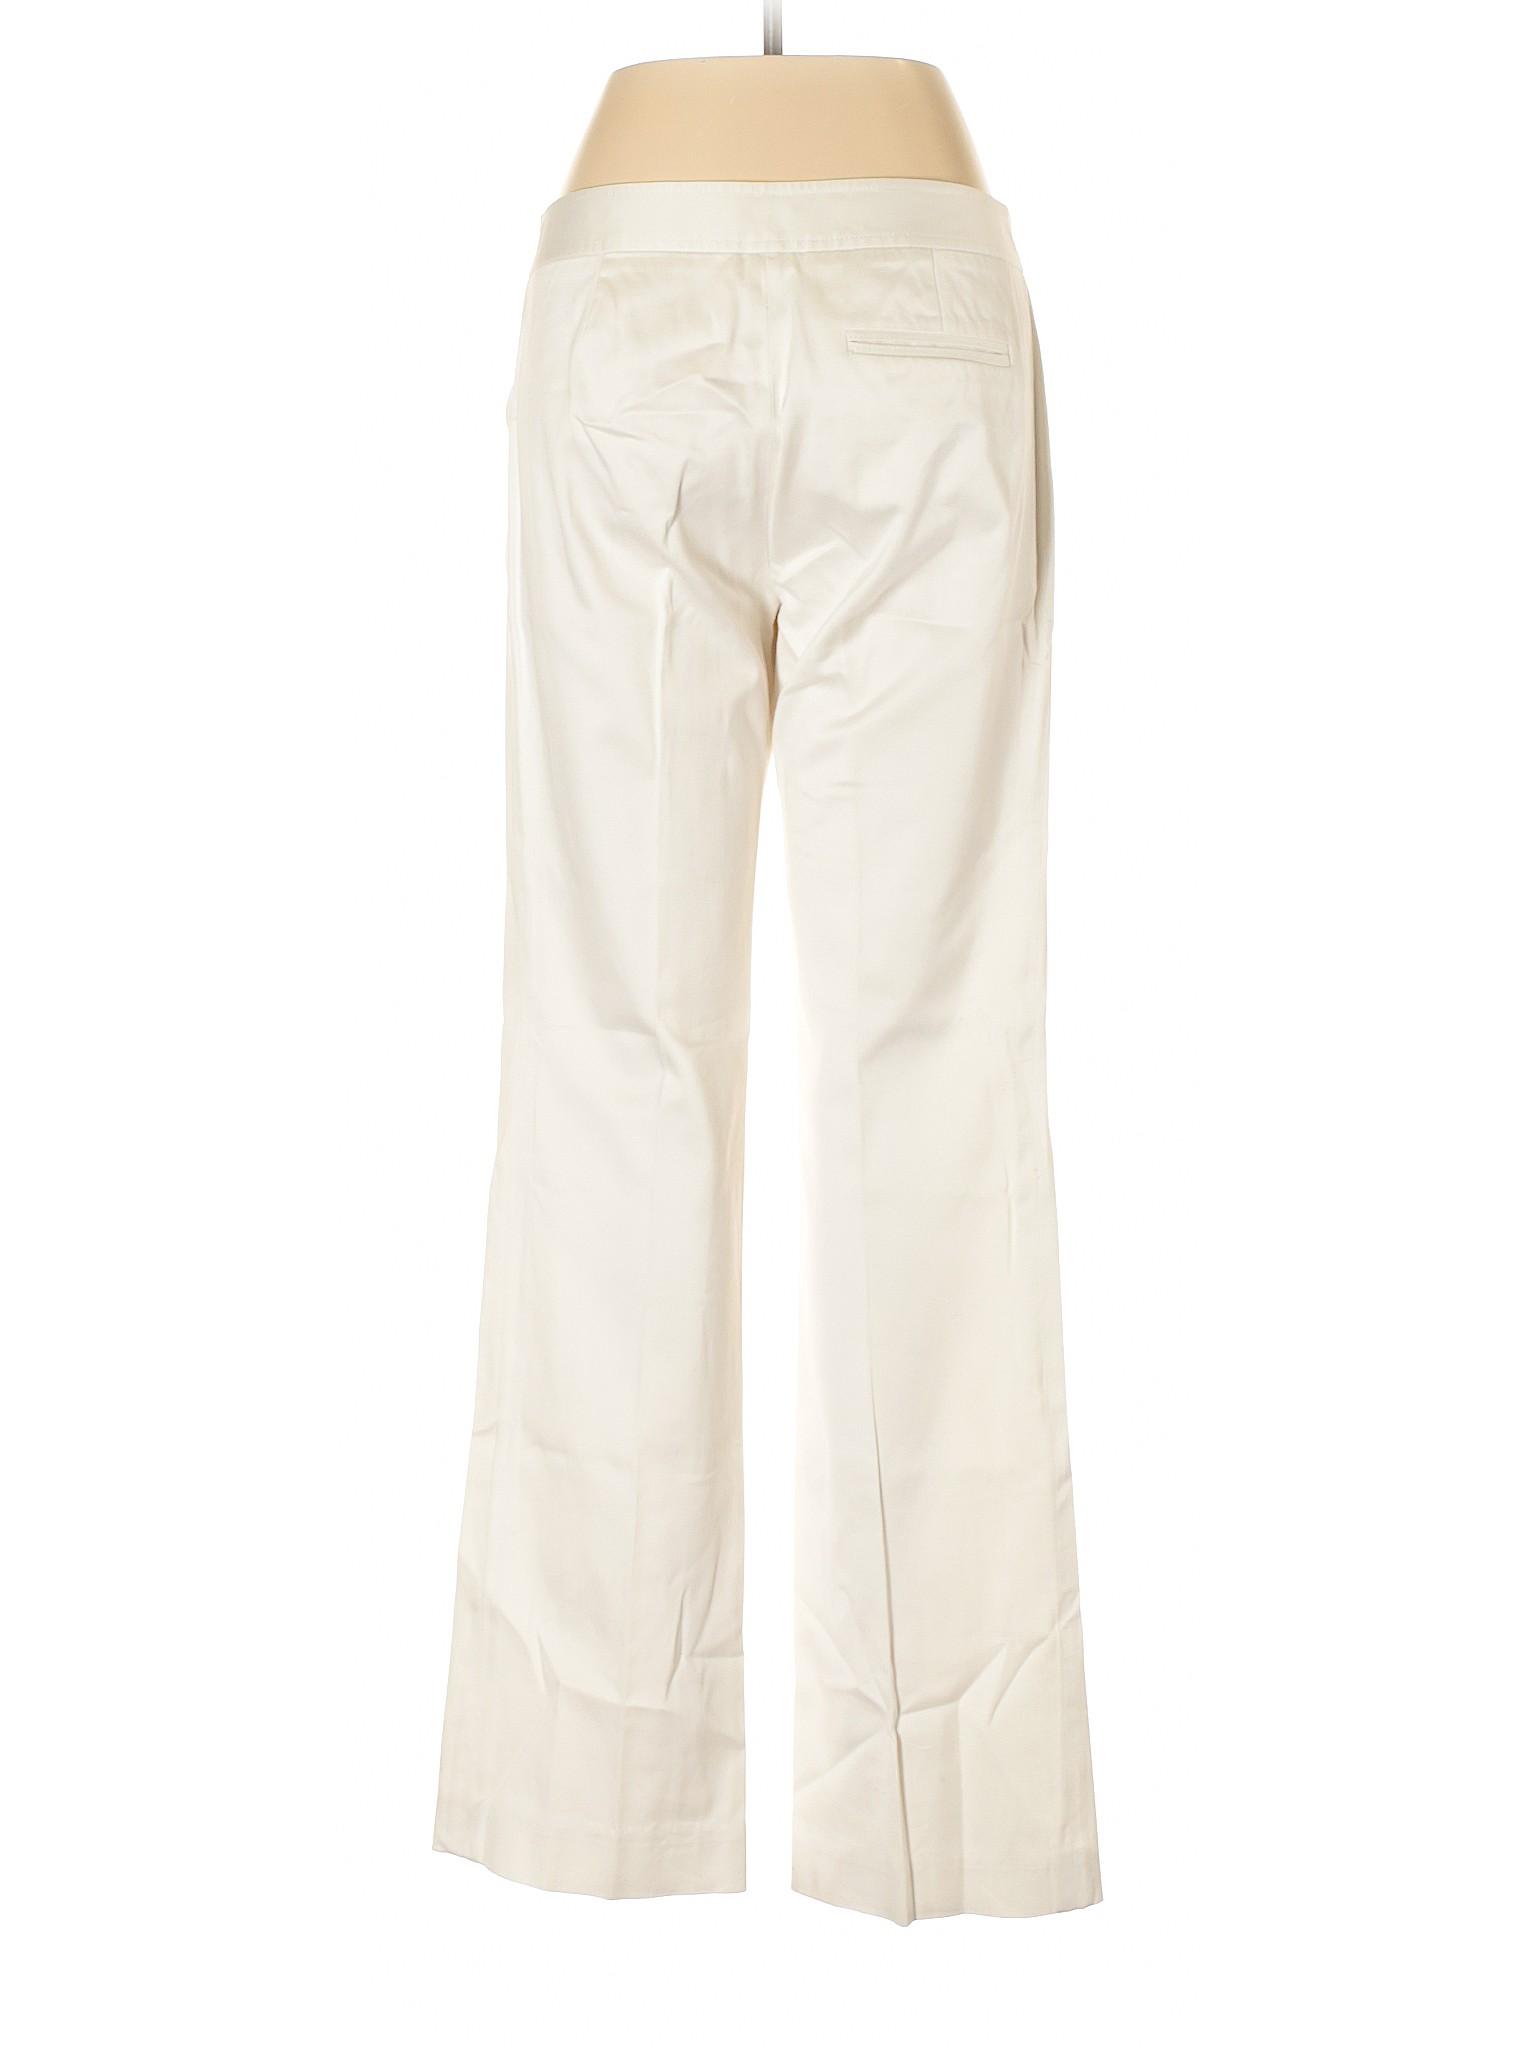 J Boutique winter Crew Casual Pants CWUv8w